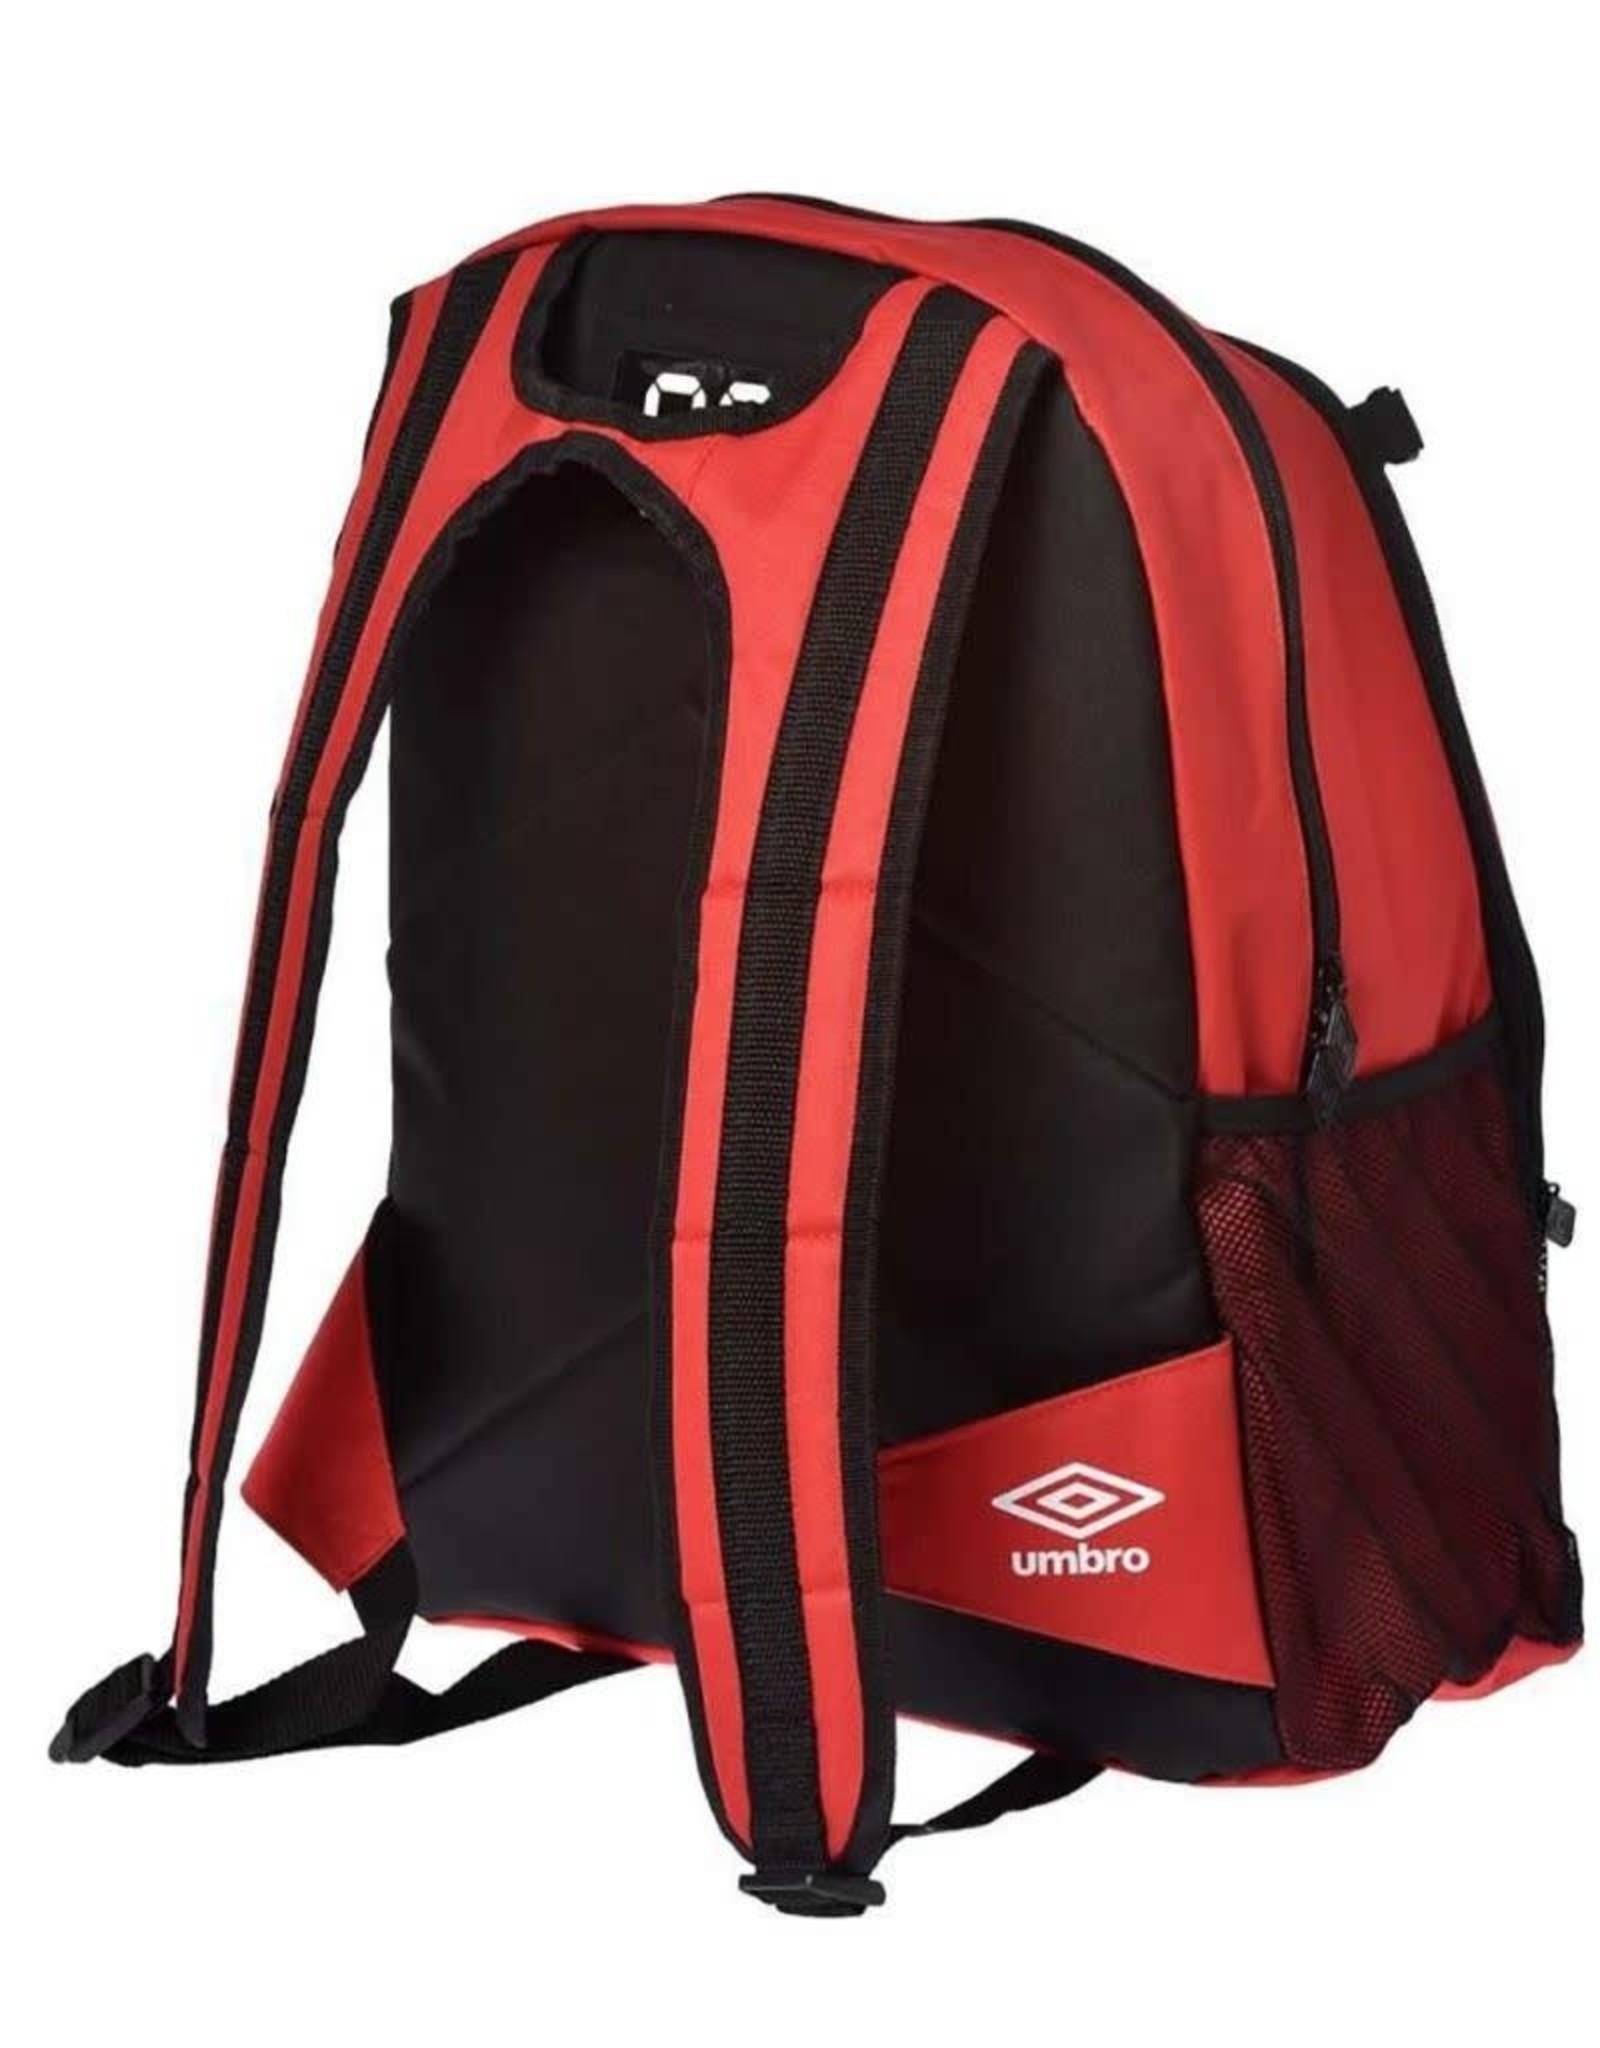 Umbro Backpack 17 Red